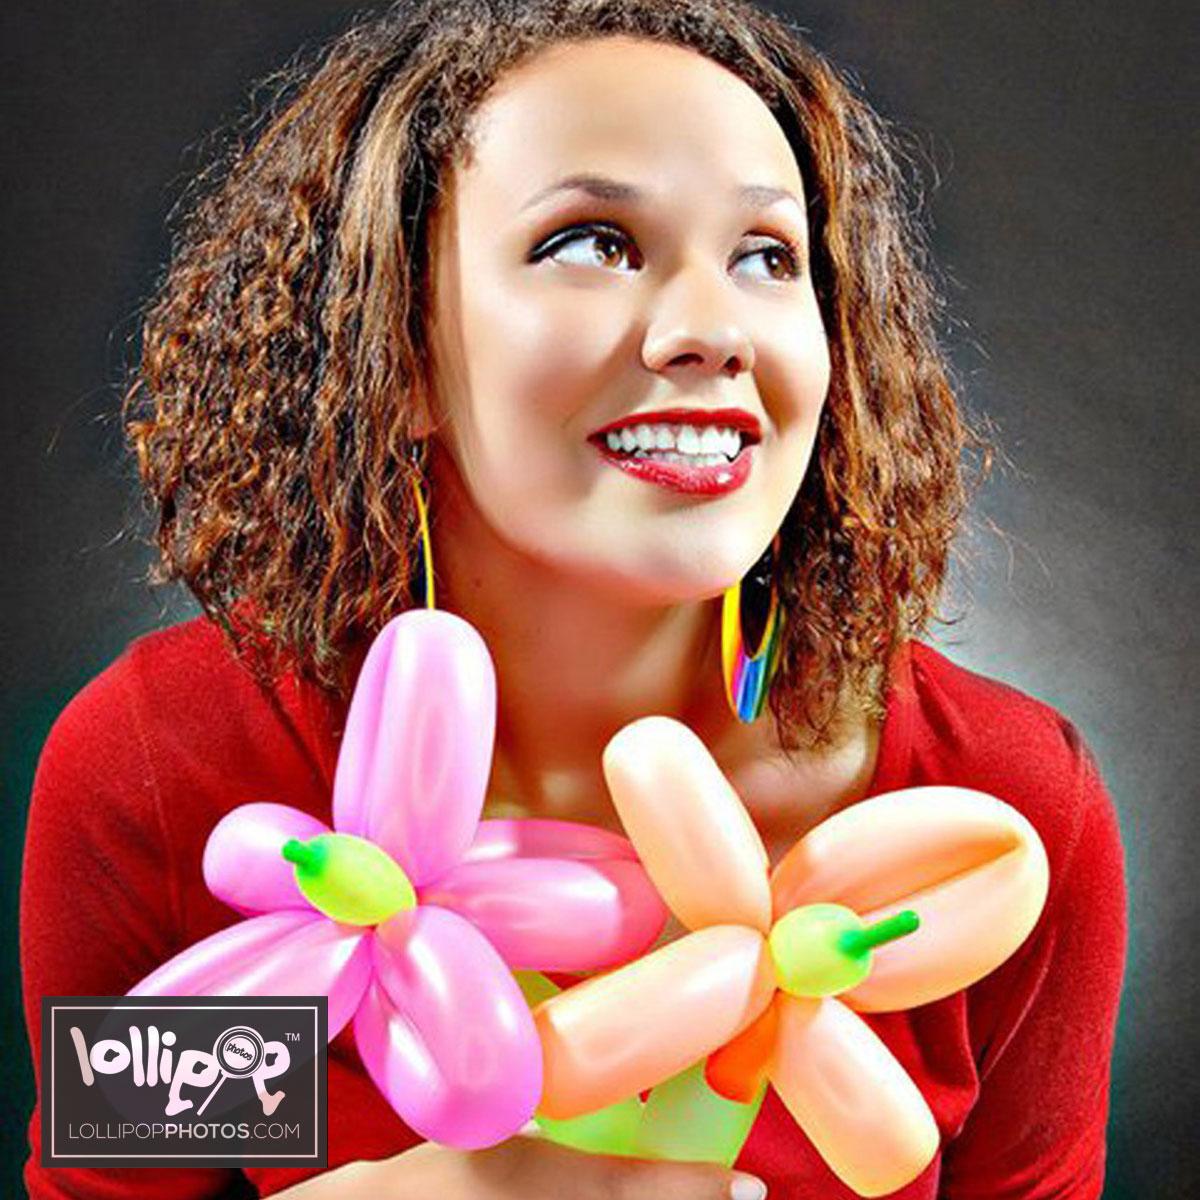 msdig-nora-canfield-lollipop-photos-062.jpg